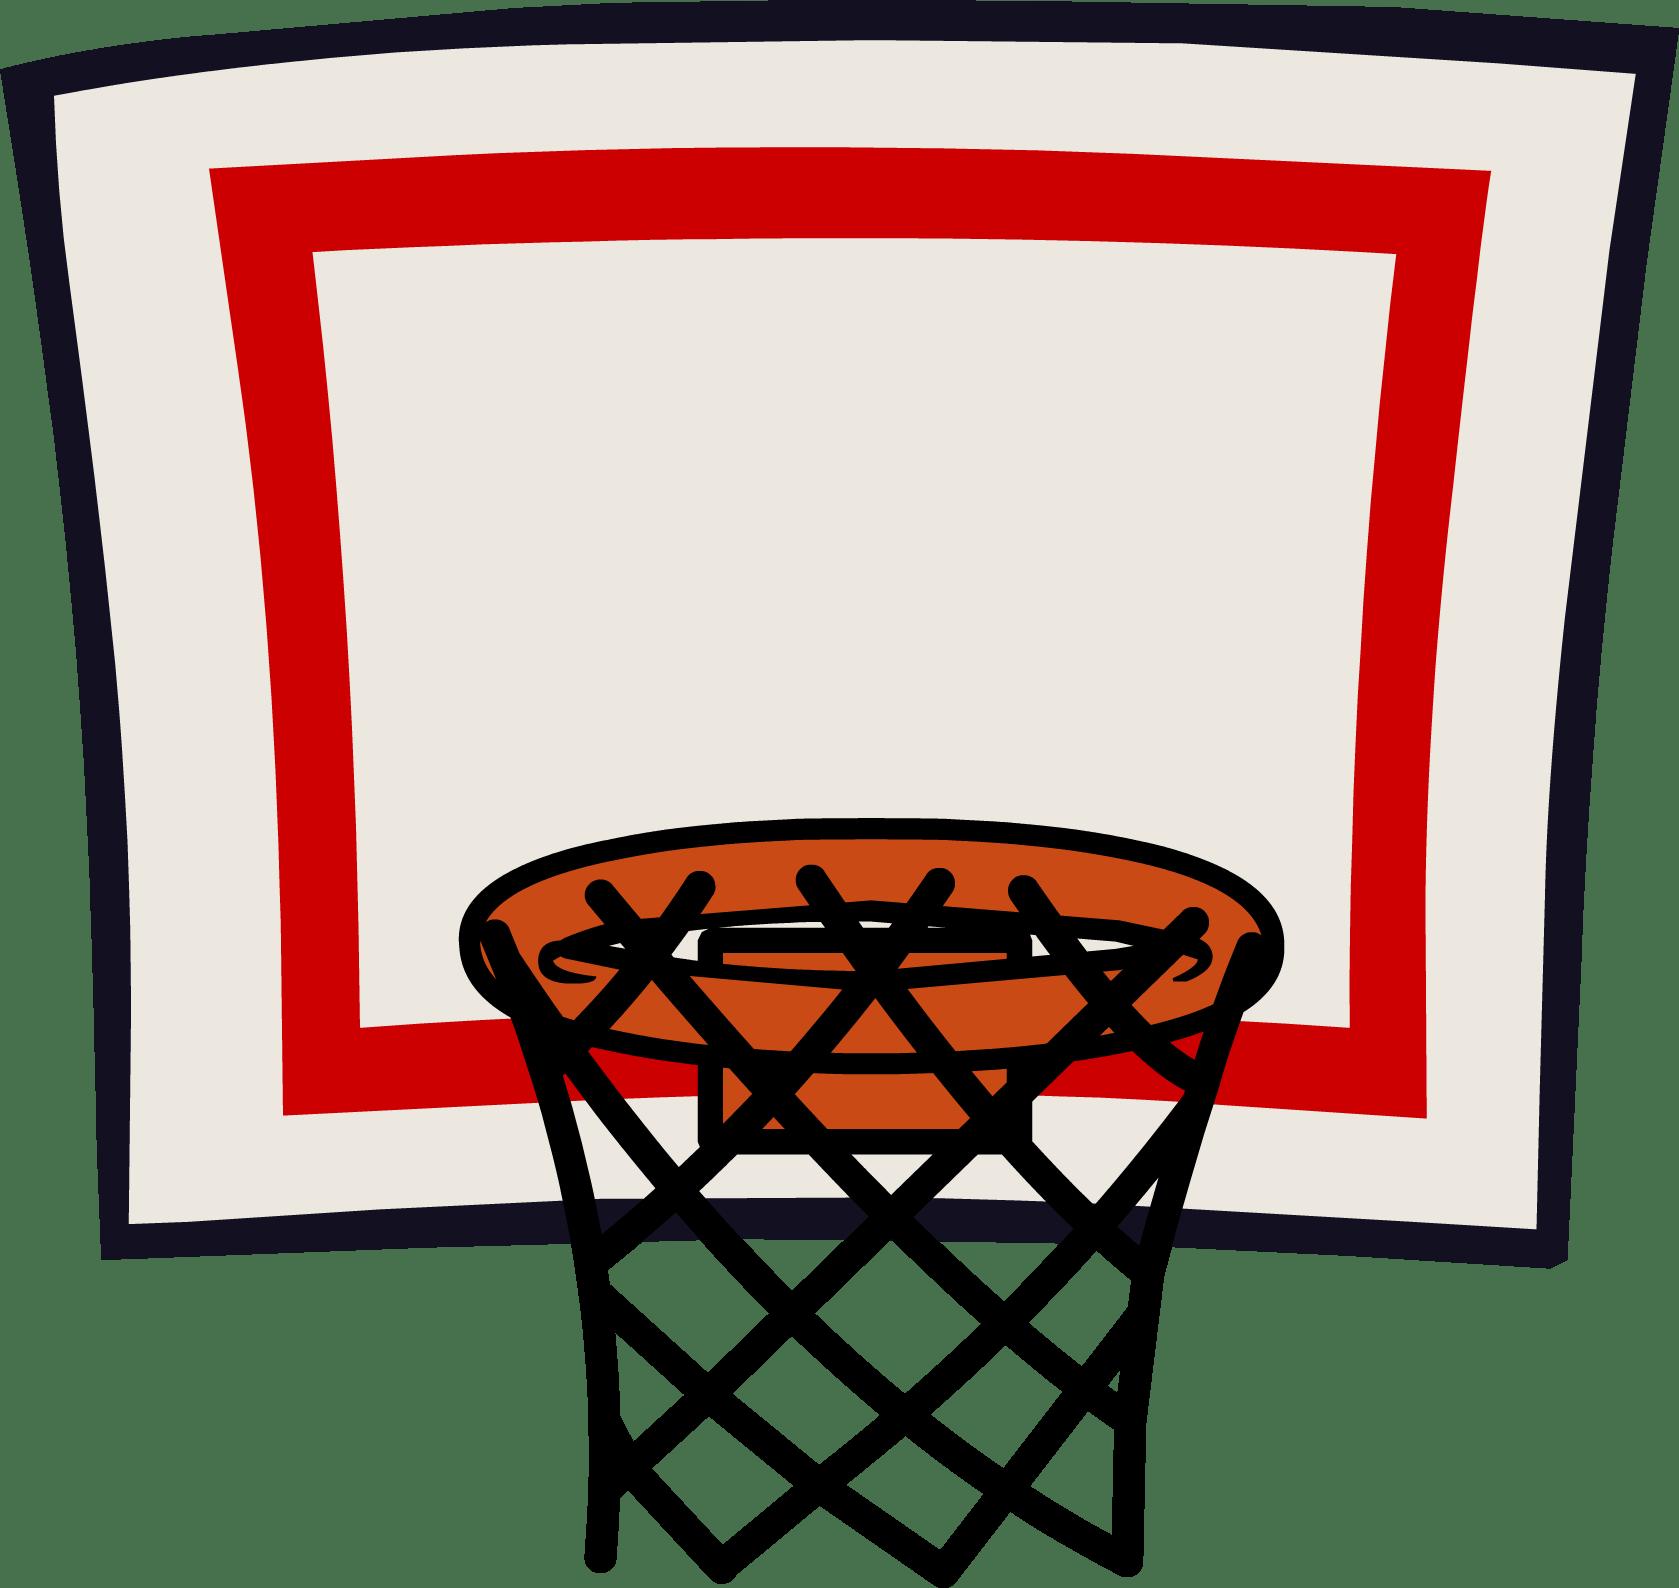 Basket clipart basketball hoop Basketball ring art Basketball Free